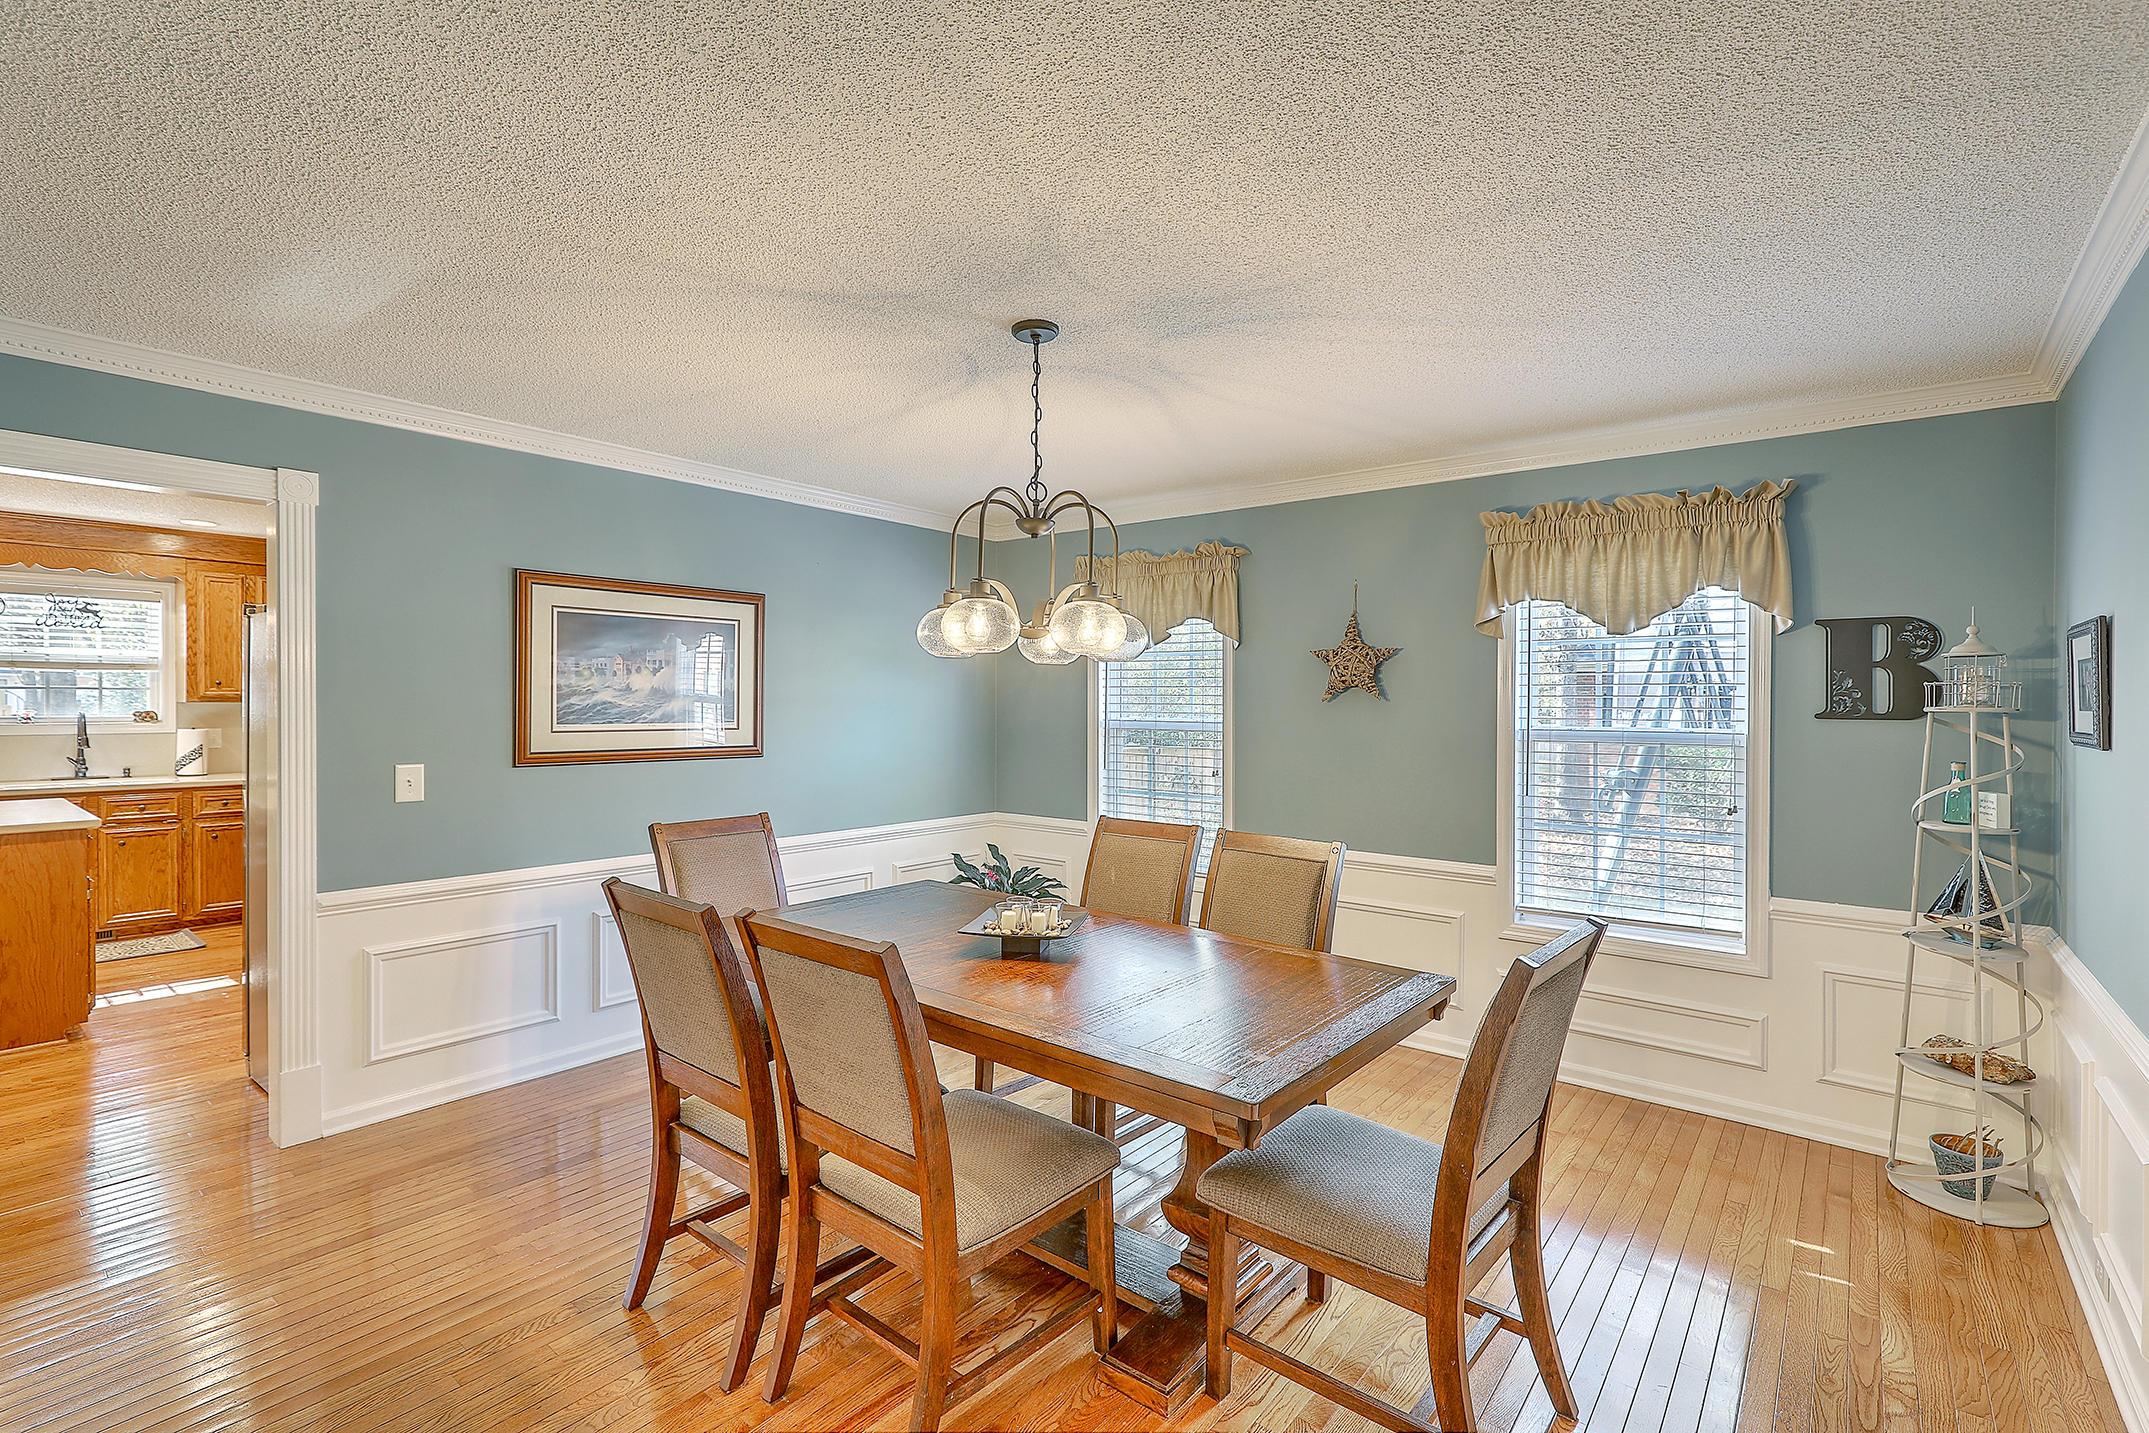 Crowfield Plantation Homes For Sale - 104 Jamesford, Goose Creek, SC - 15